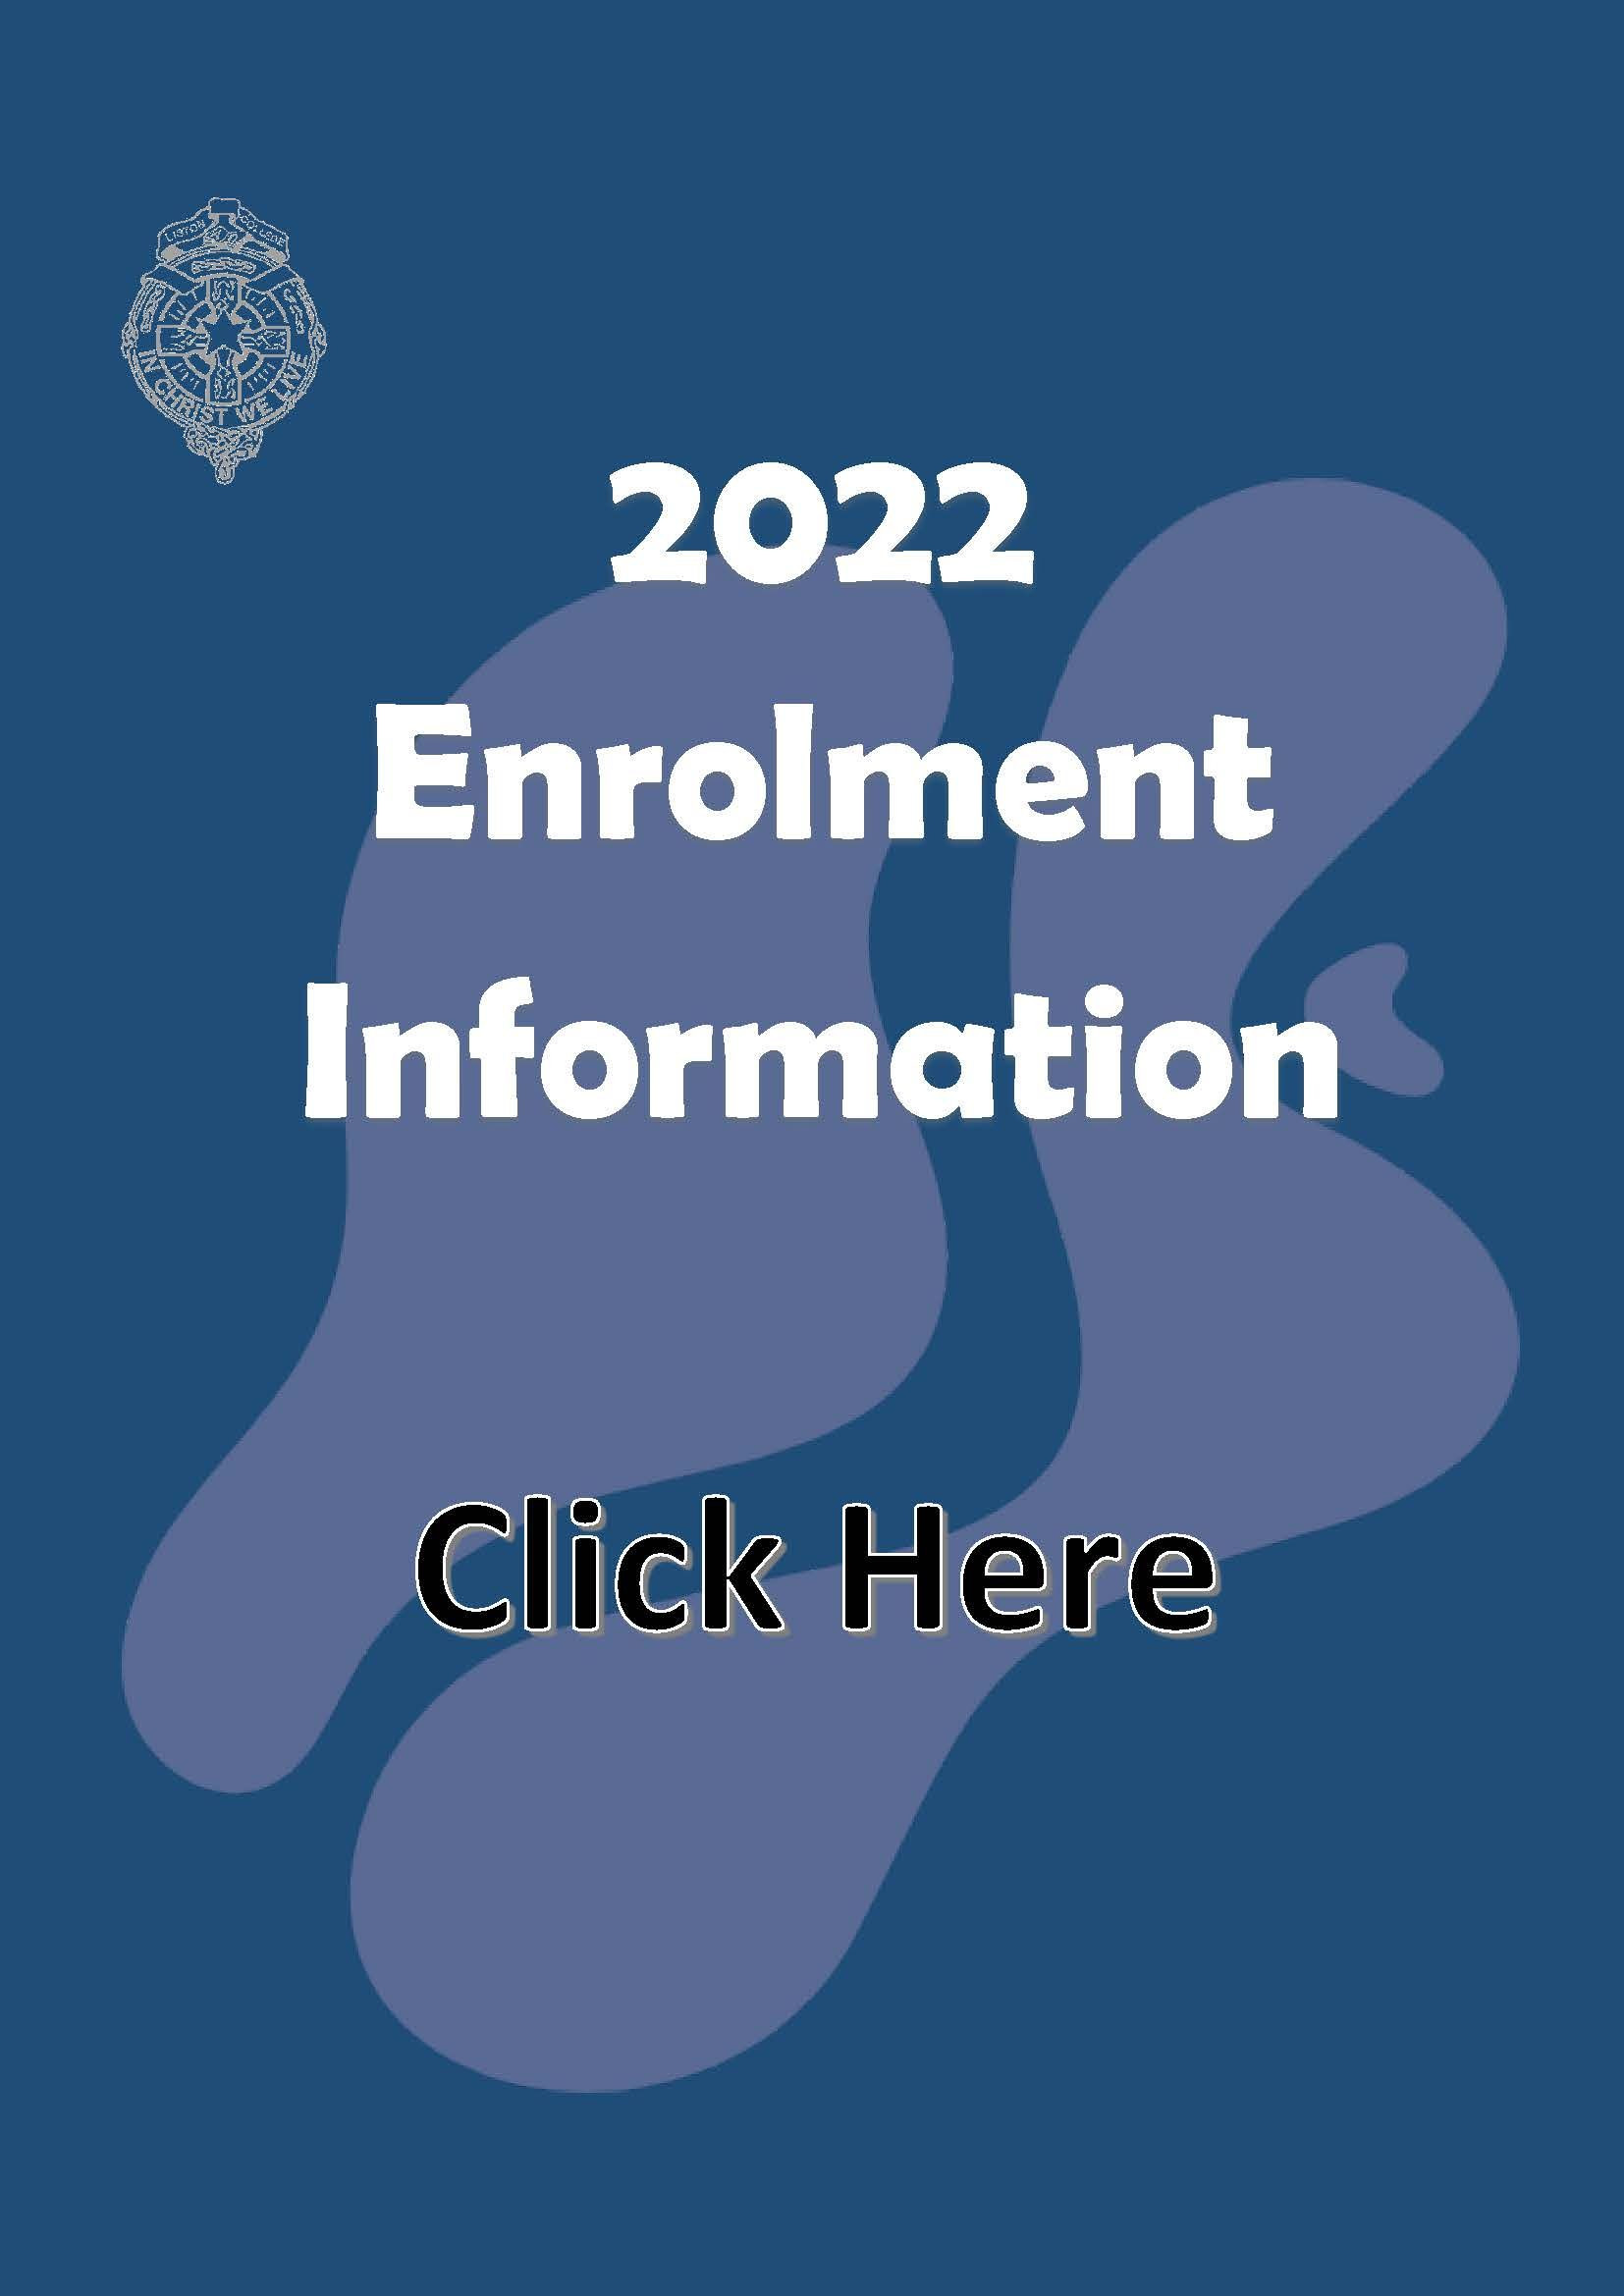 2022 Enrolment Information